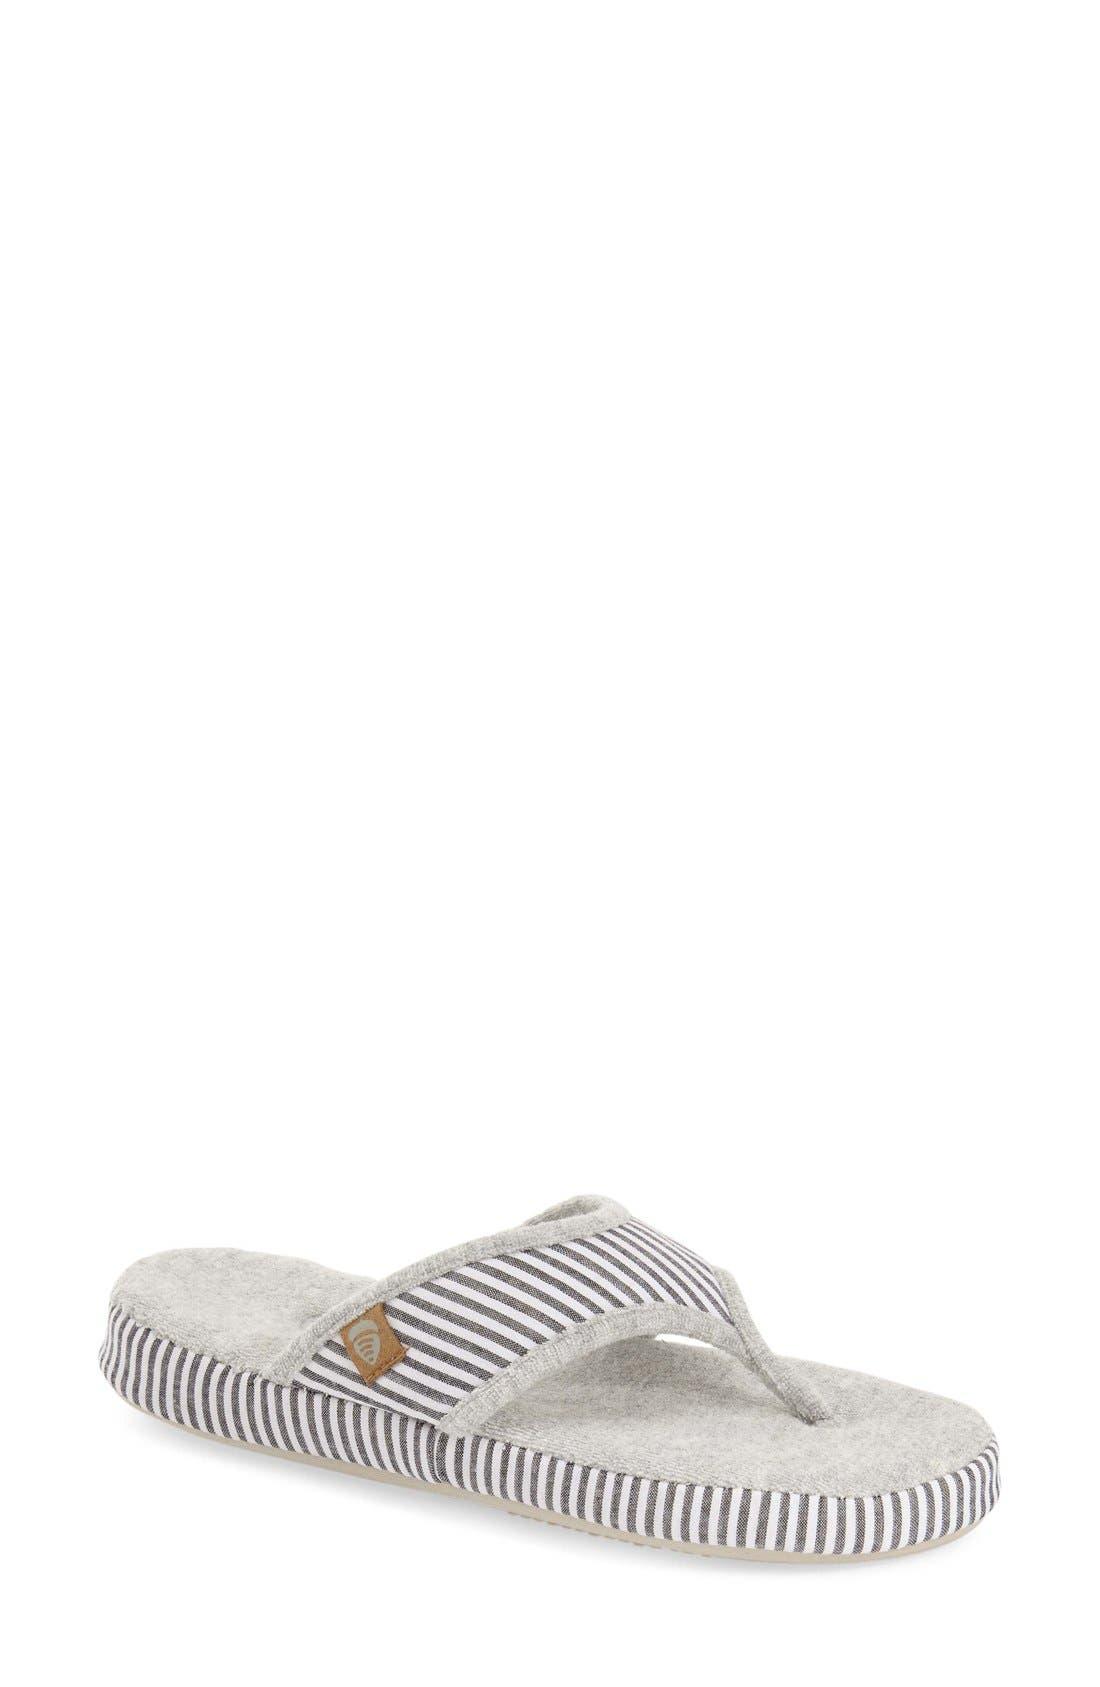 'Summerweight' Slipper,                             Main thumbnail 1, color,                             Grey Strip Fabric